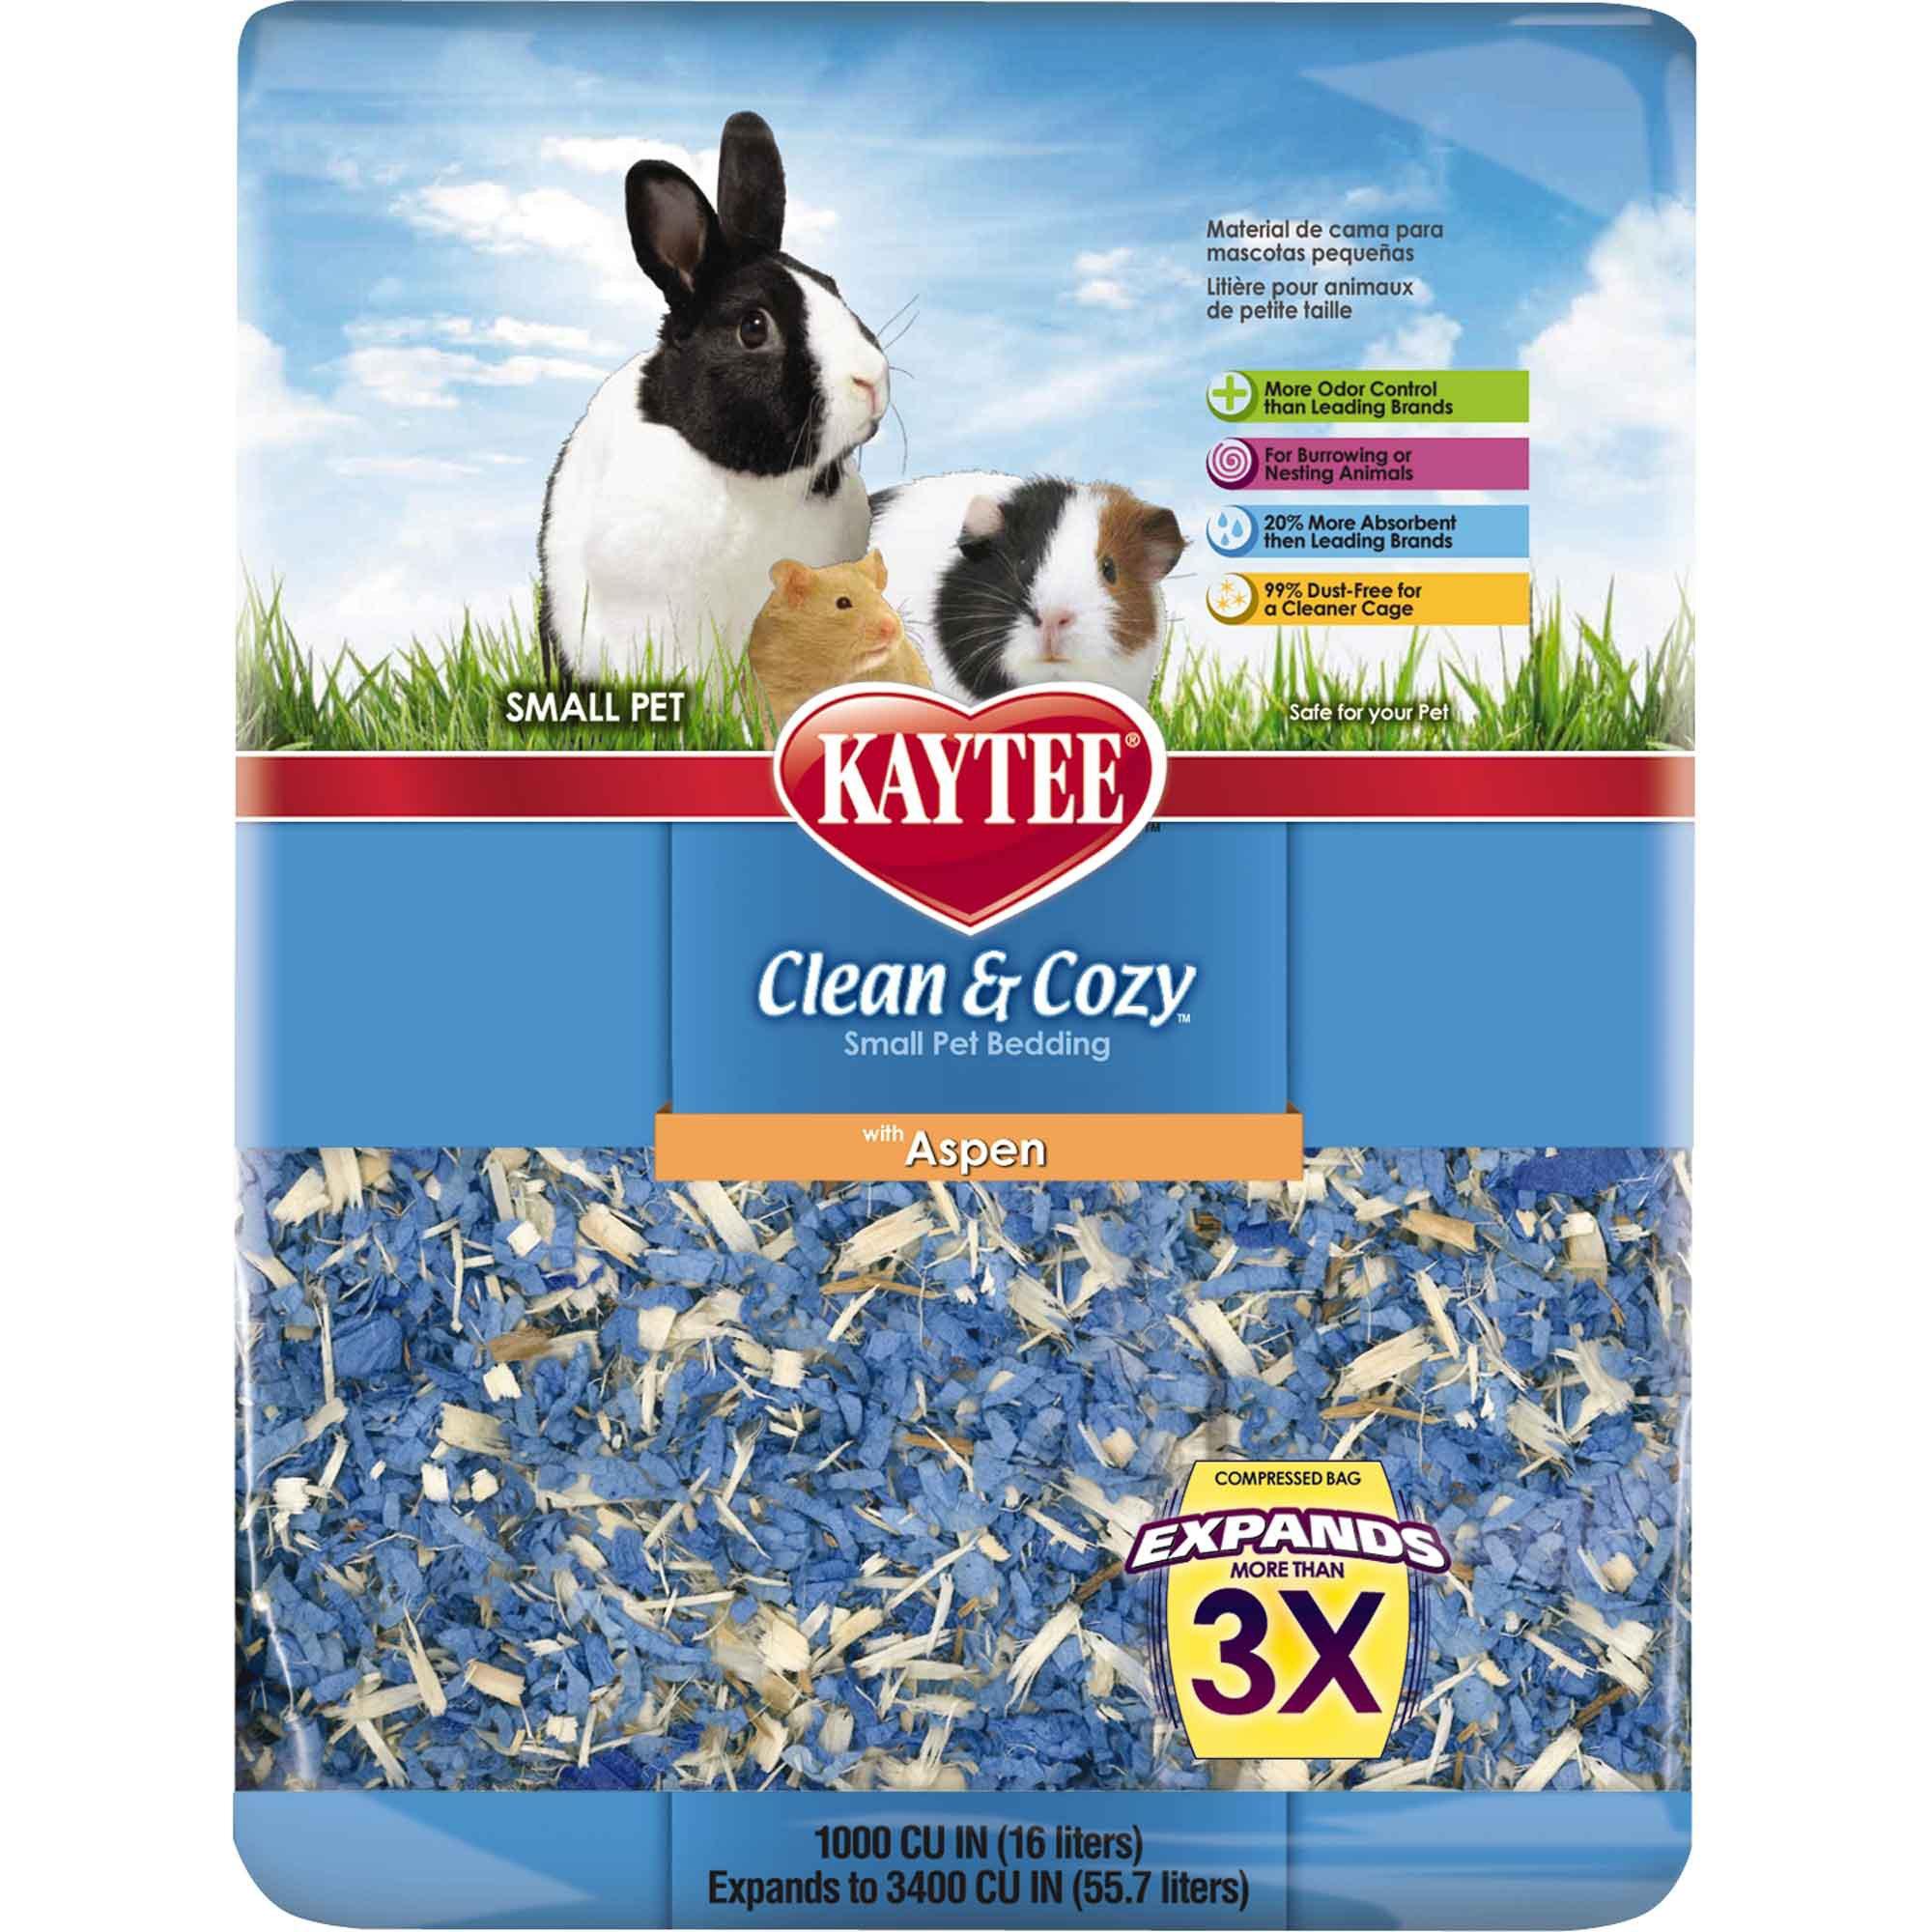 Kaytee Clean & Cozy Aspen Small Animal Bedding